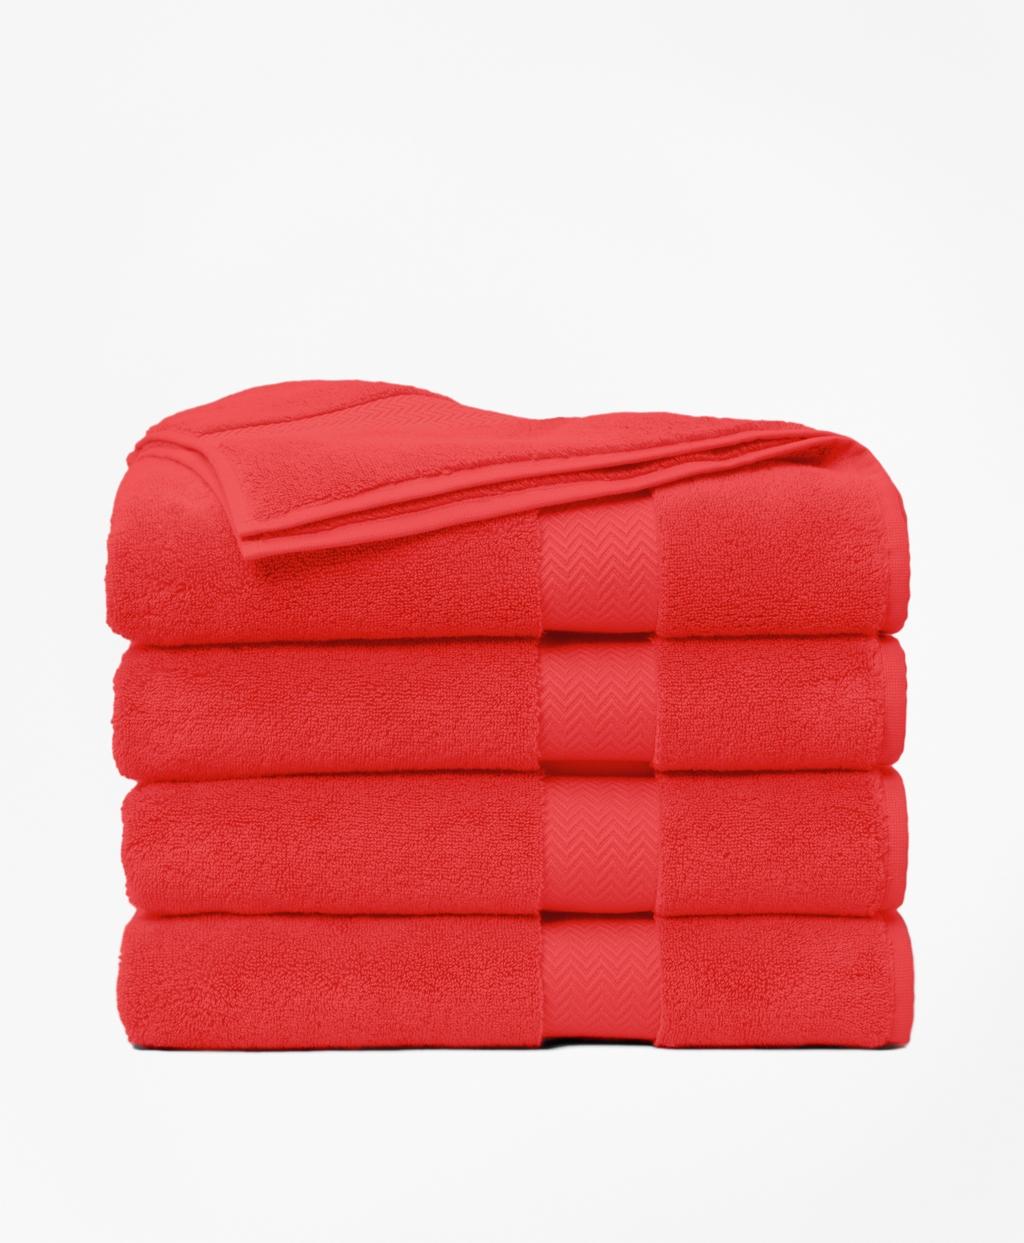 Brooksbrothers Terry Bath Towel